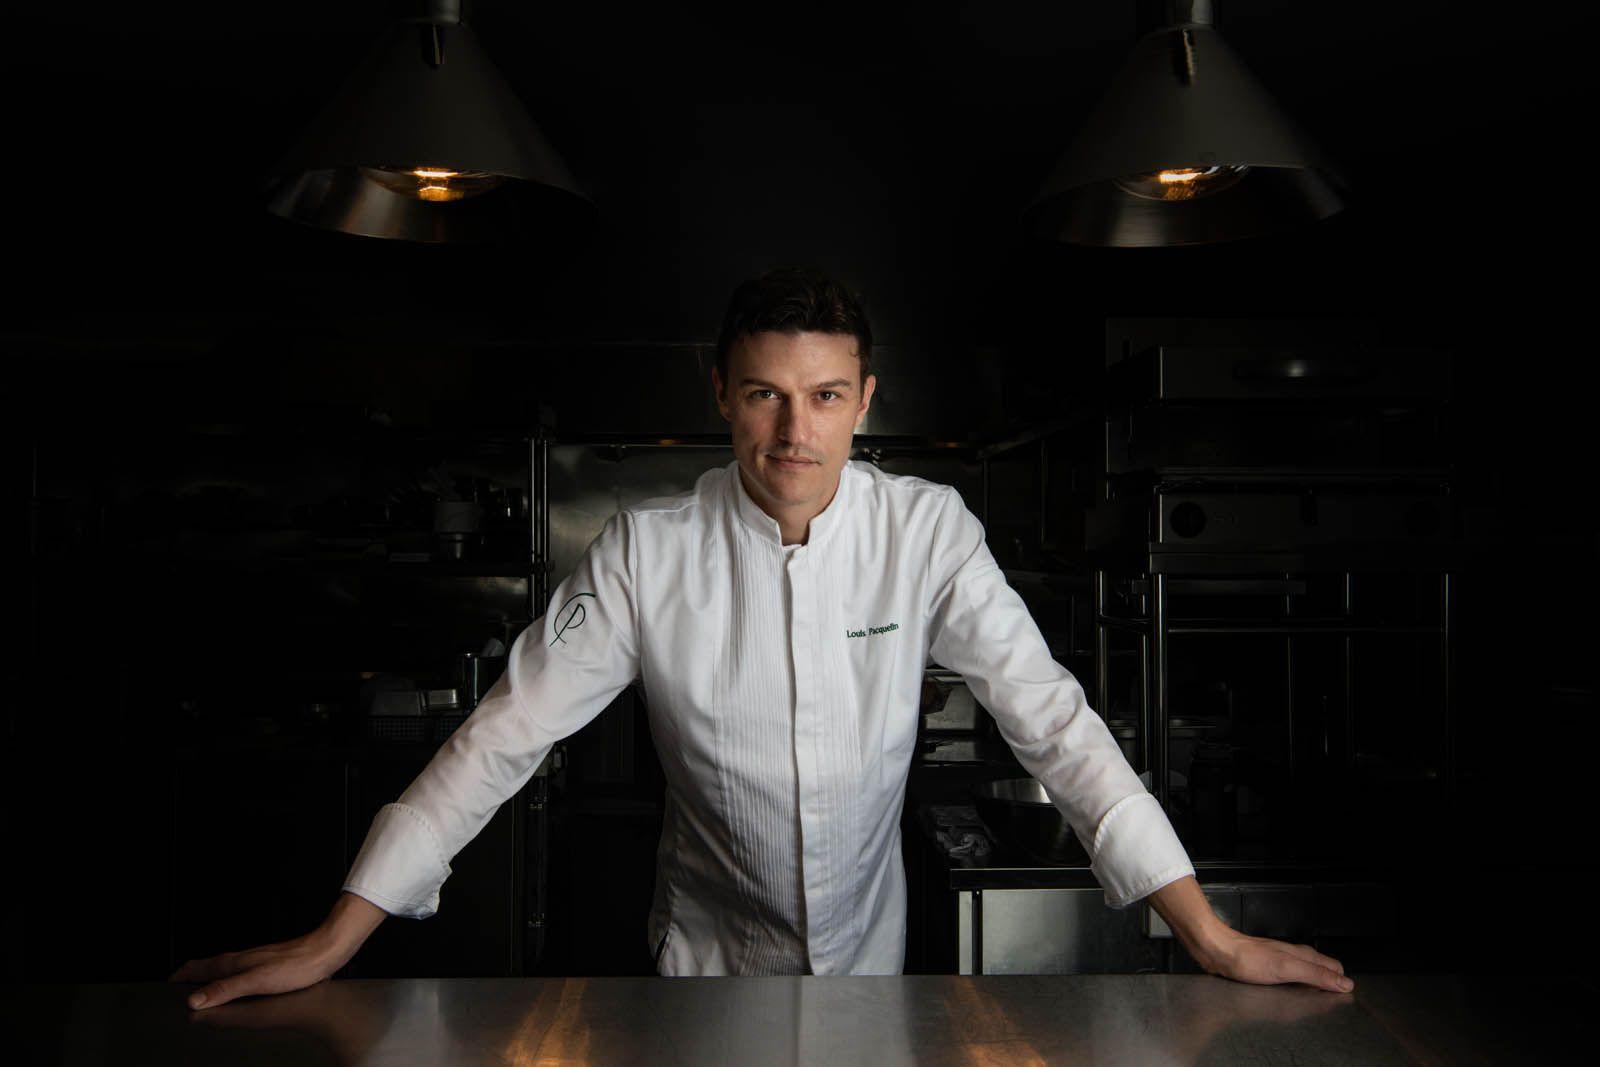 Chef Louis Pacquelin